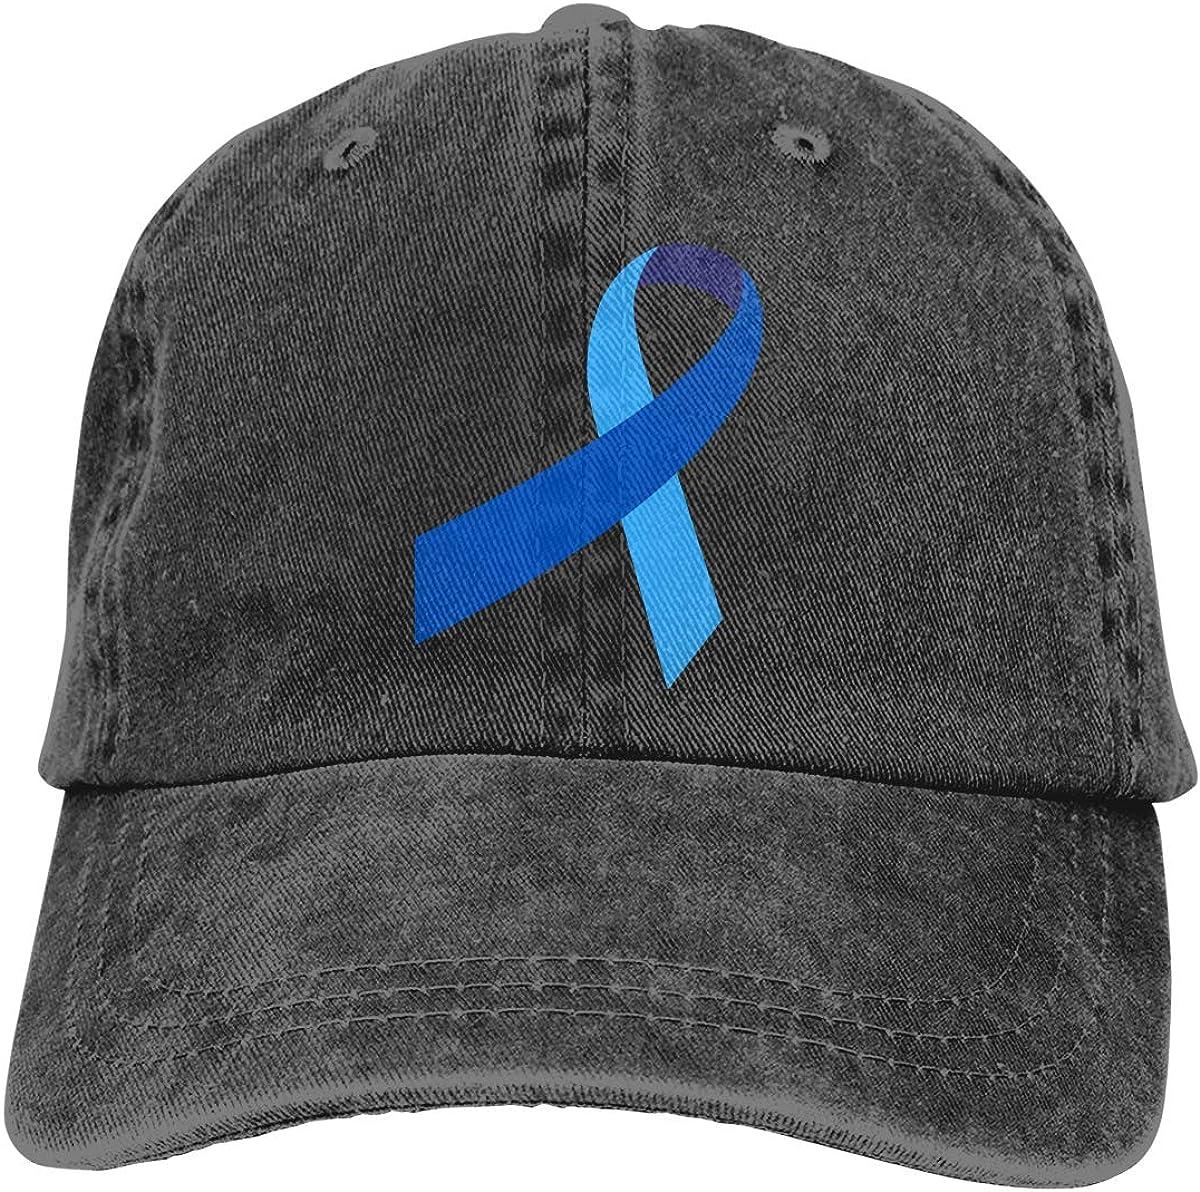 Prostate Cancer Unisex Trendy Cowboy Hat Sun Hat Adjustable Baseball Cap